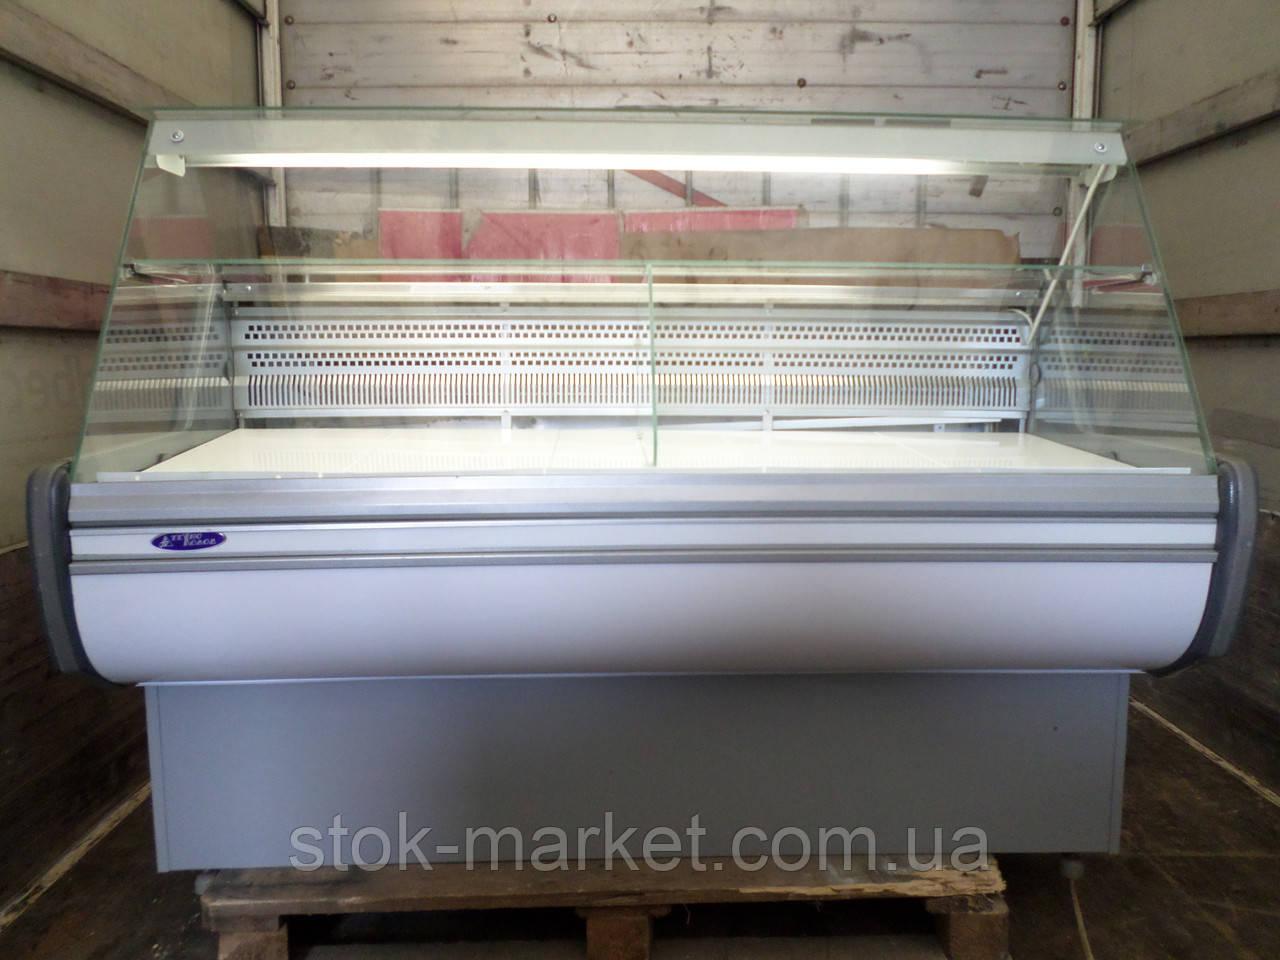 Холодильная витрина Технохолод Небраска 1,6 м. бу , холодильный прилавок б/у